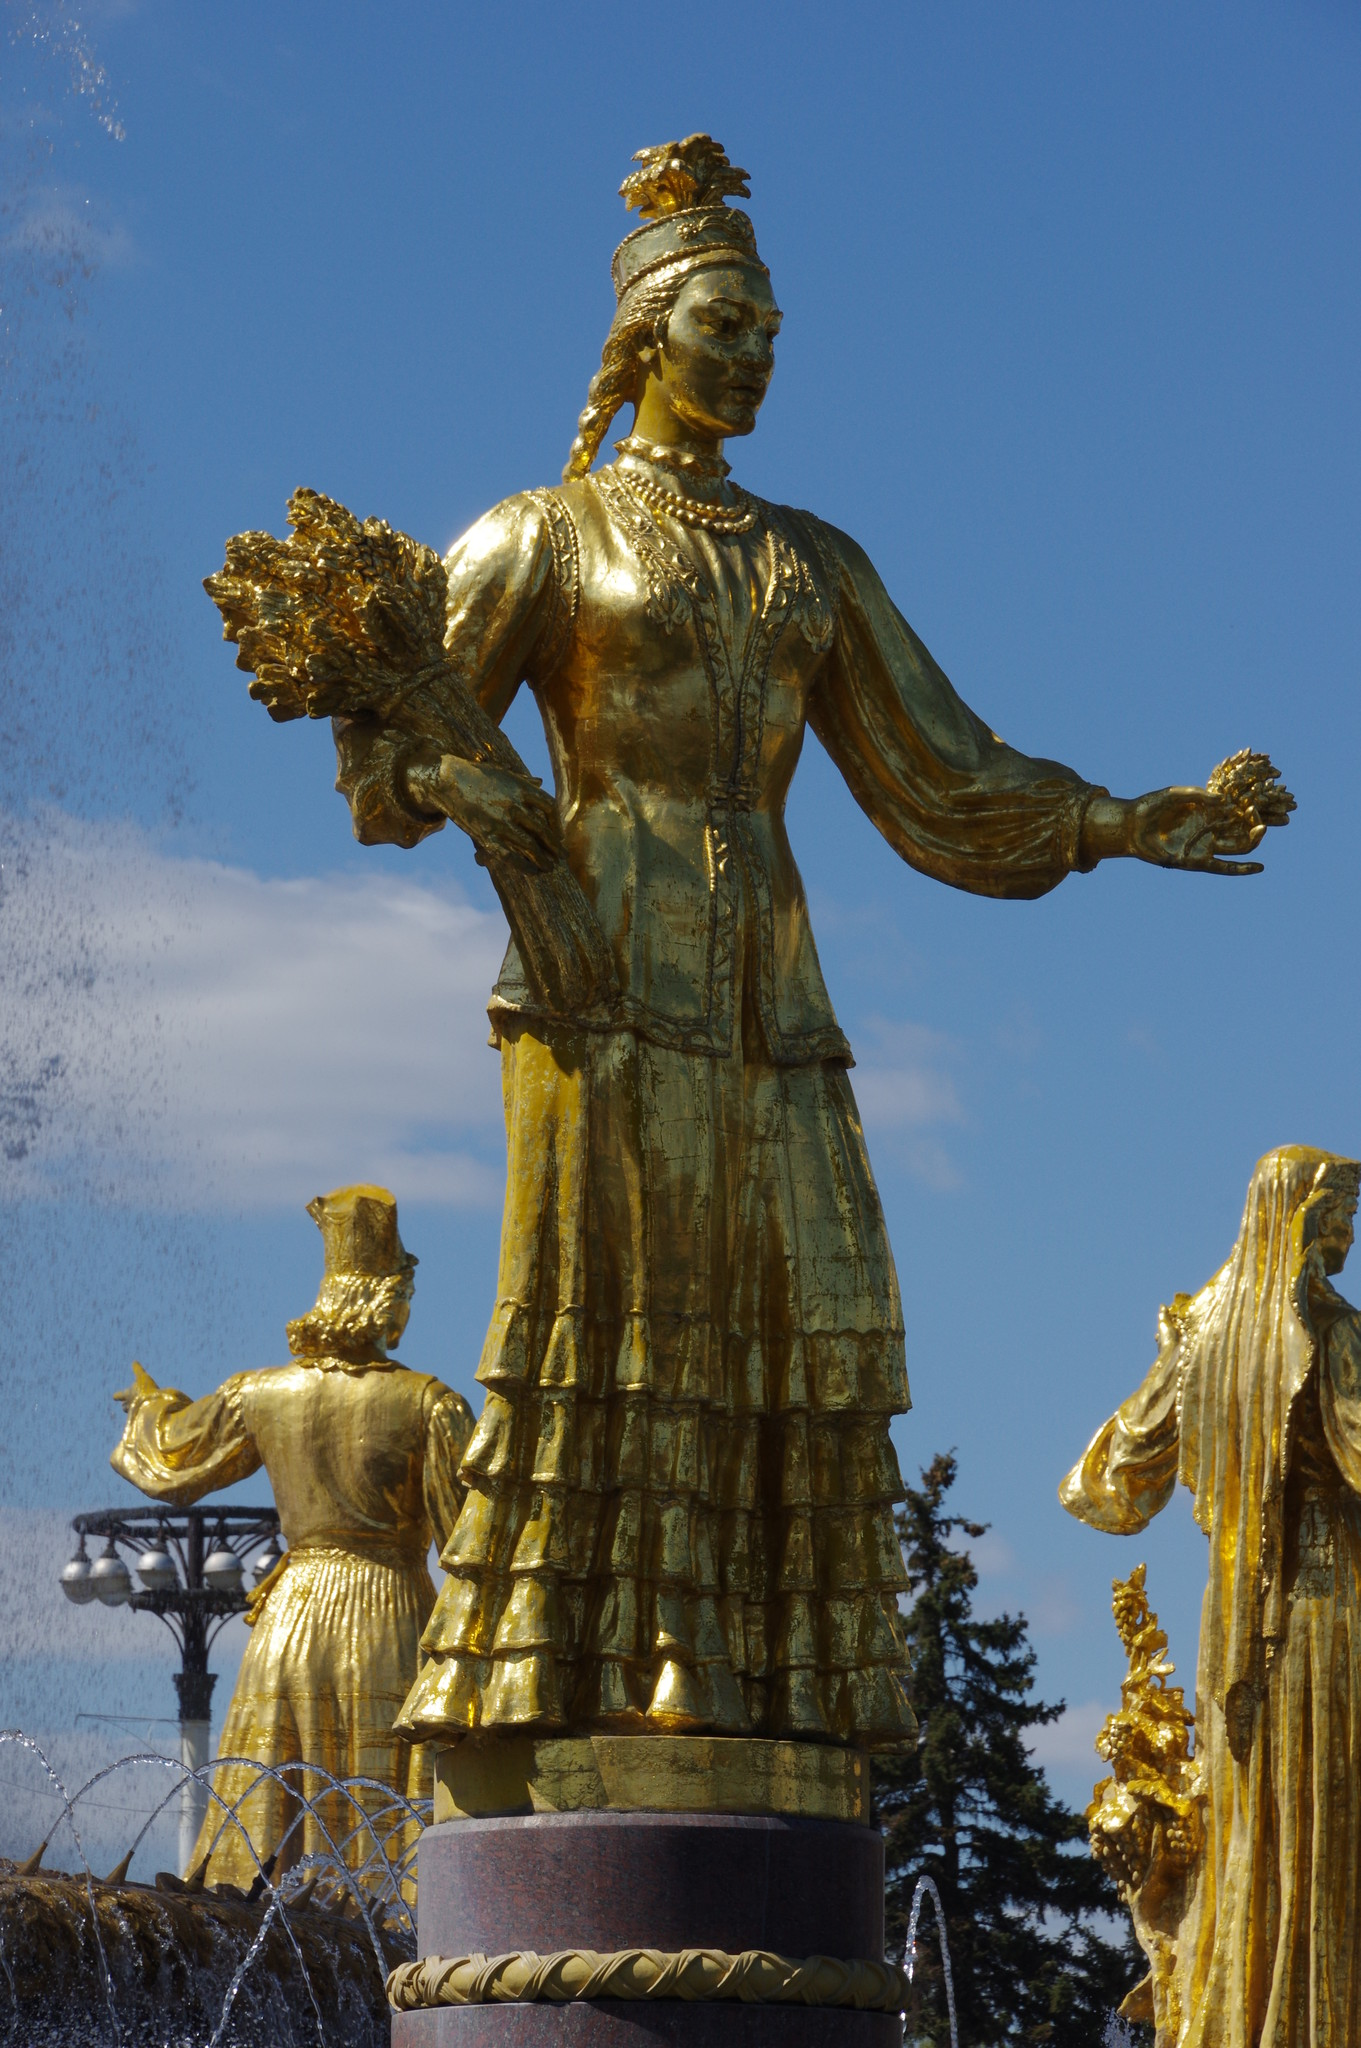 Фонтан «Дружба народов». Казахстан